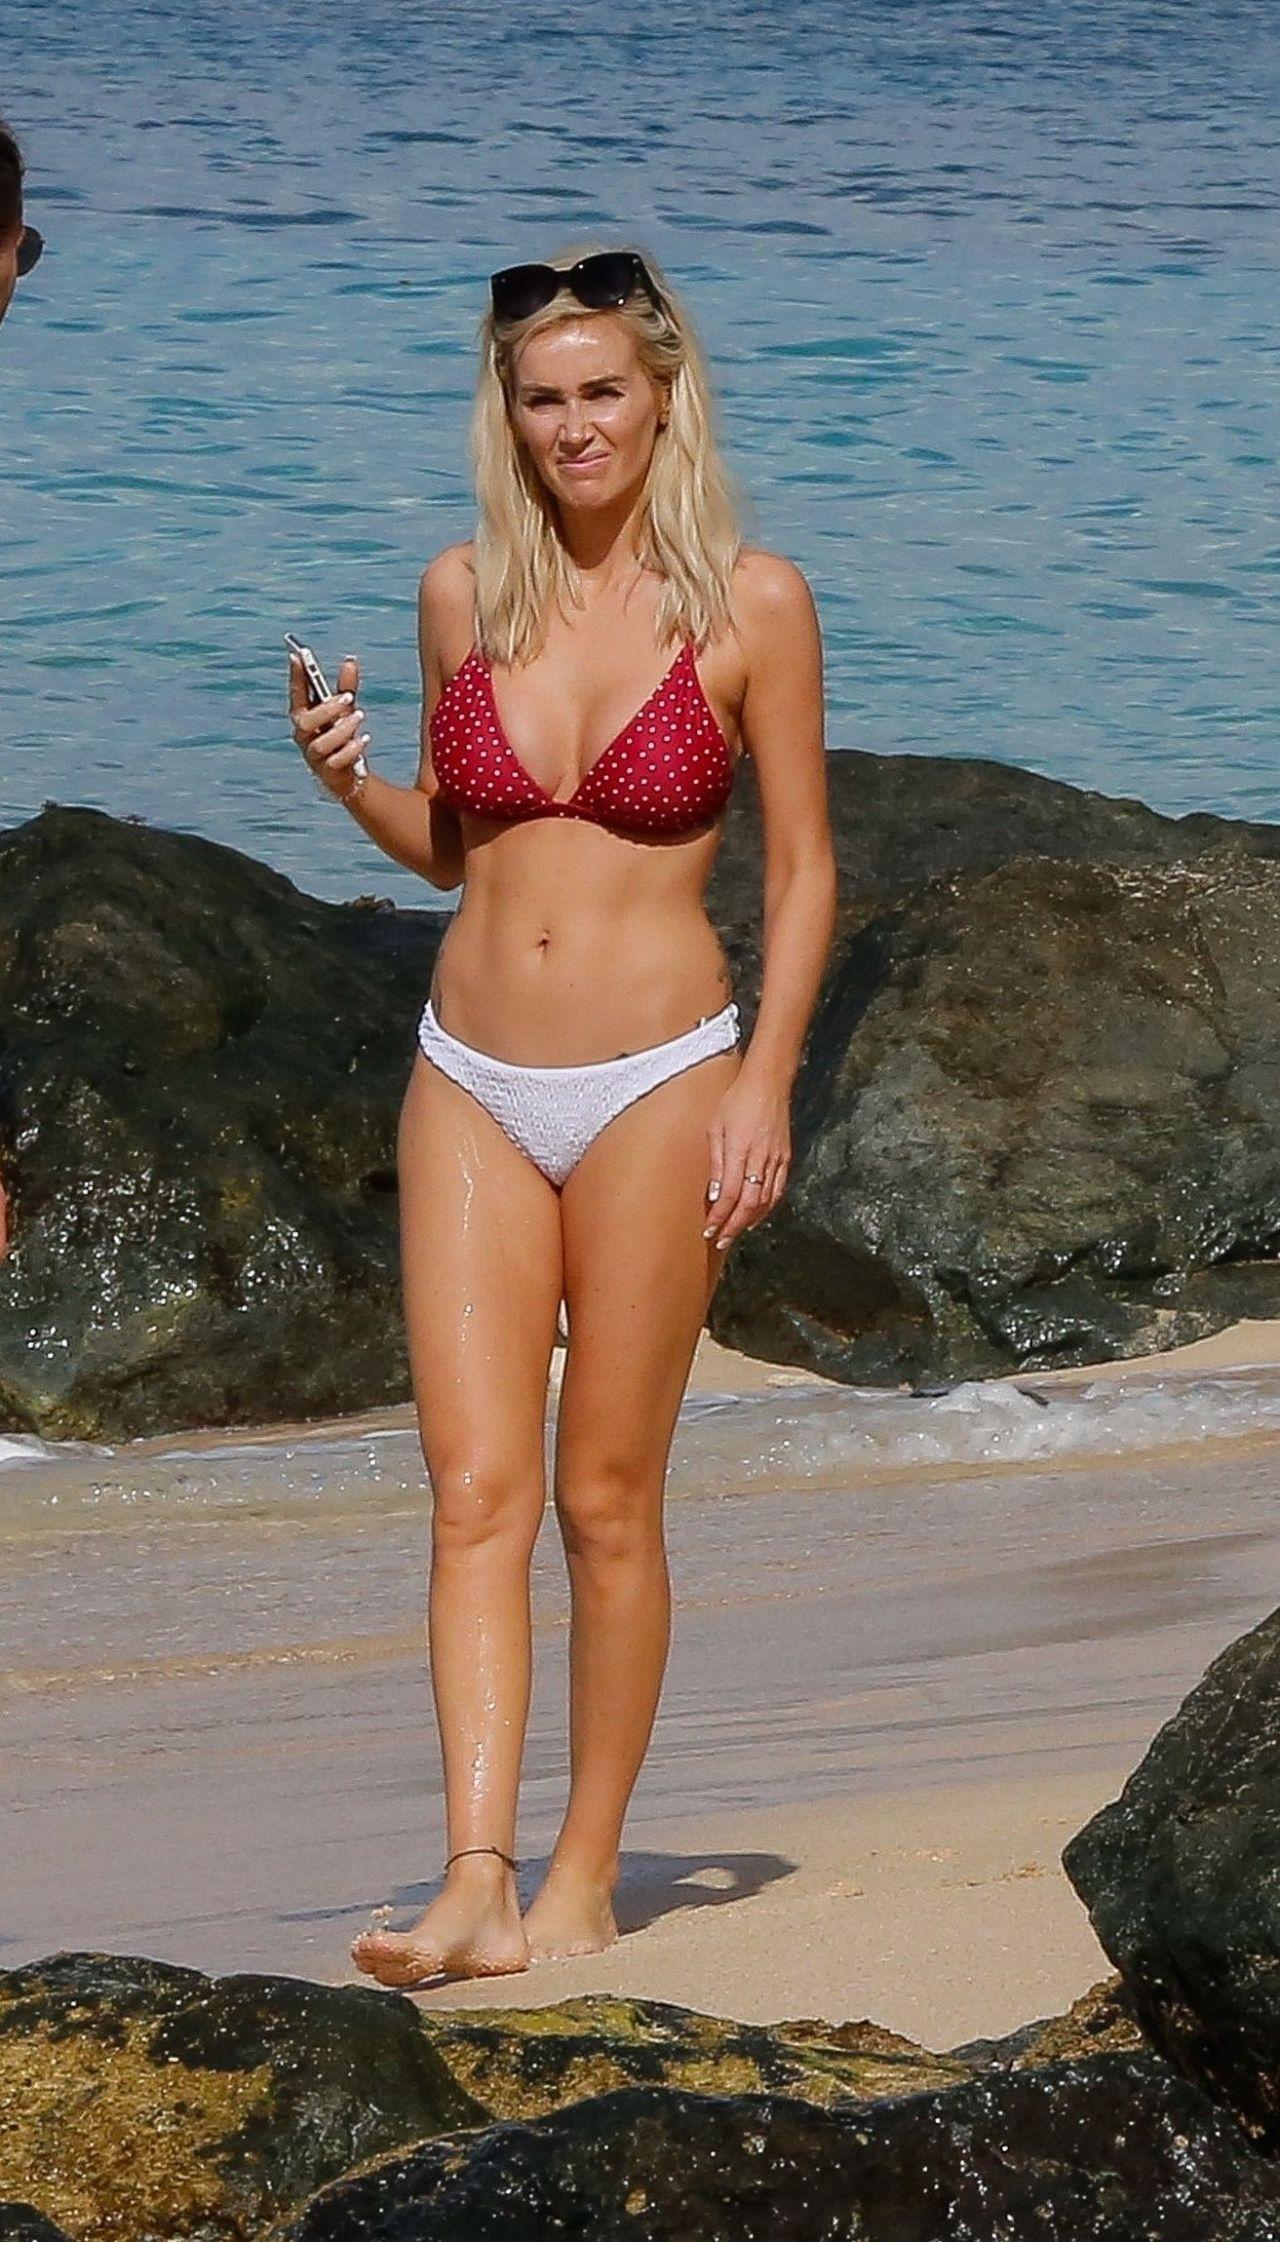 Bikini Laura Anderson nudes (76 photo), Tits, Fappening, Boobs, underwear 2006